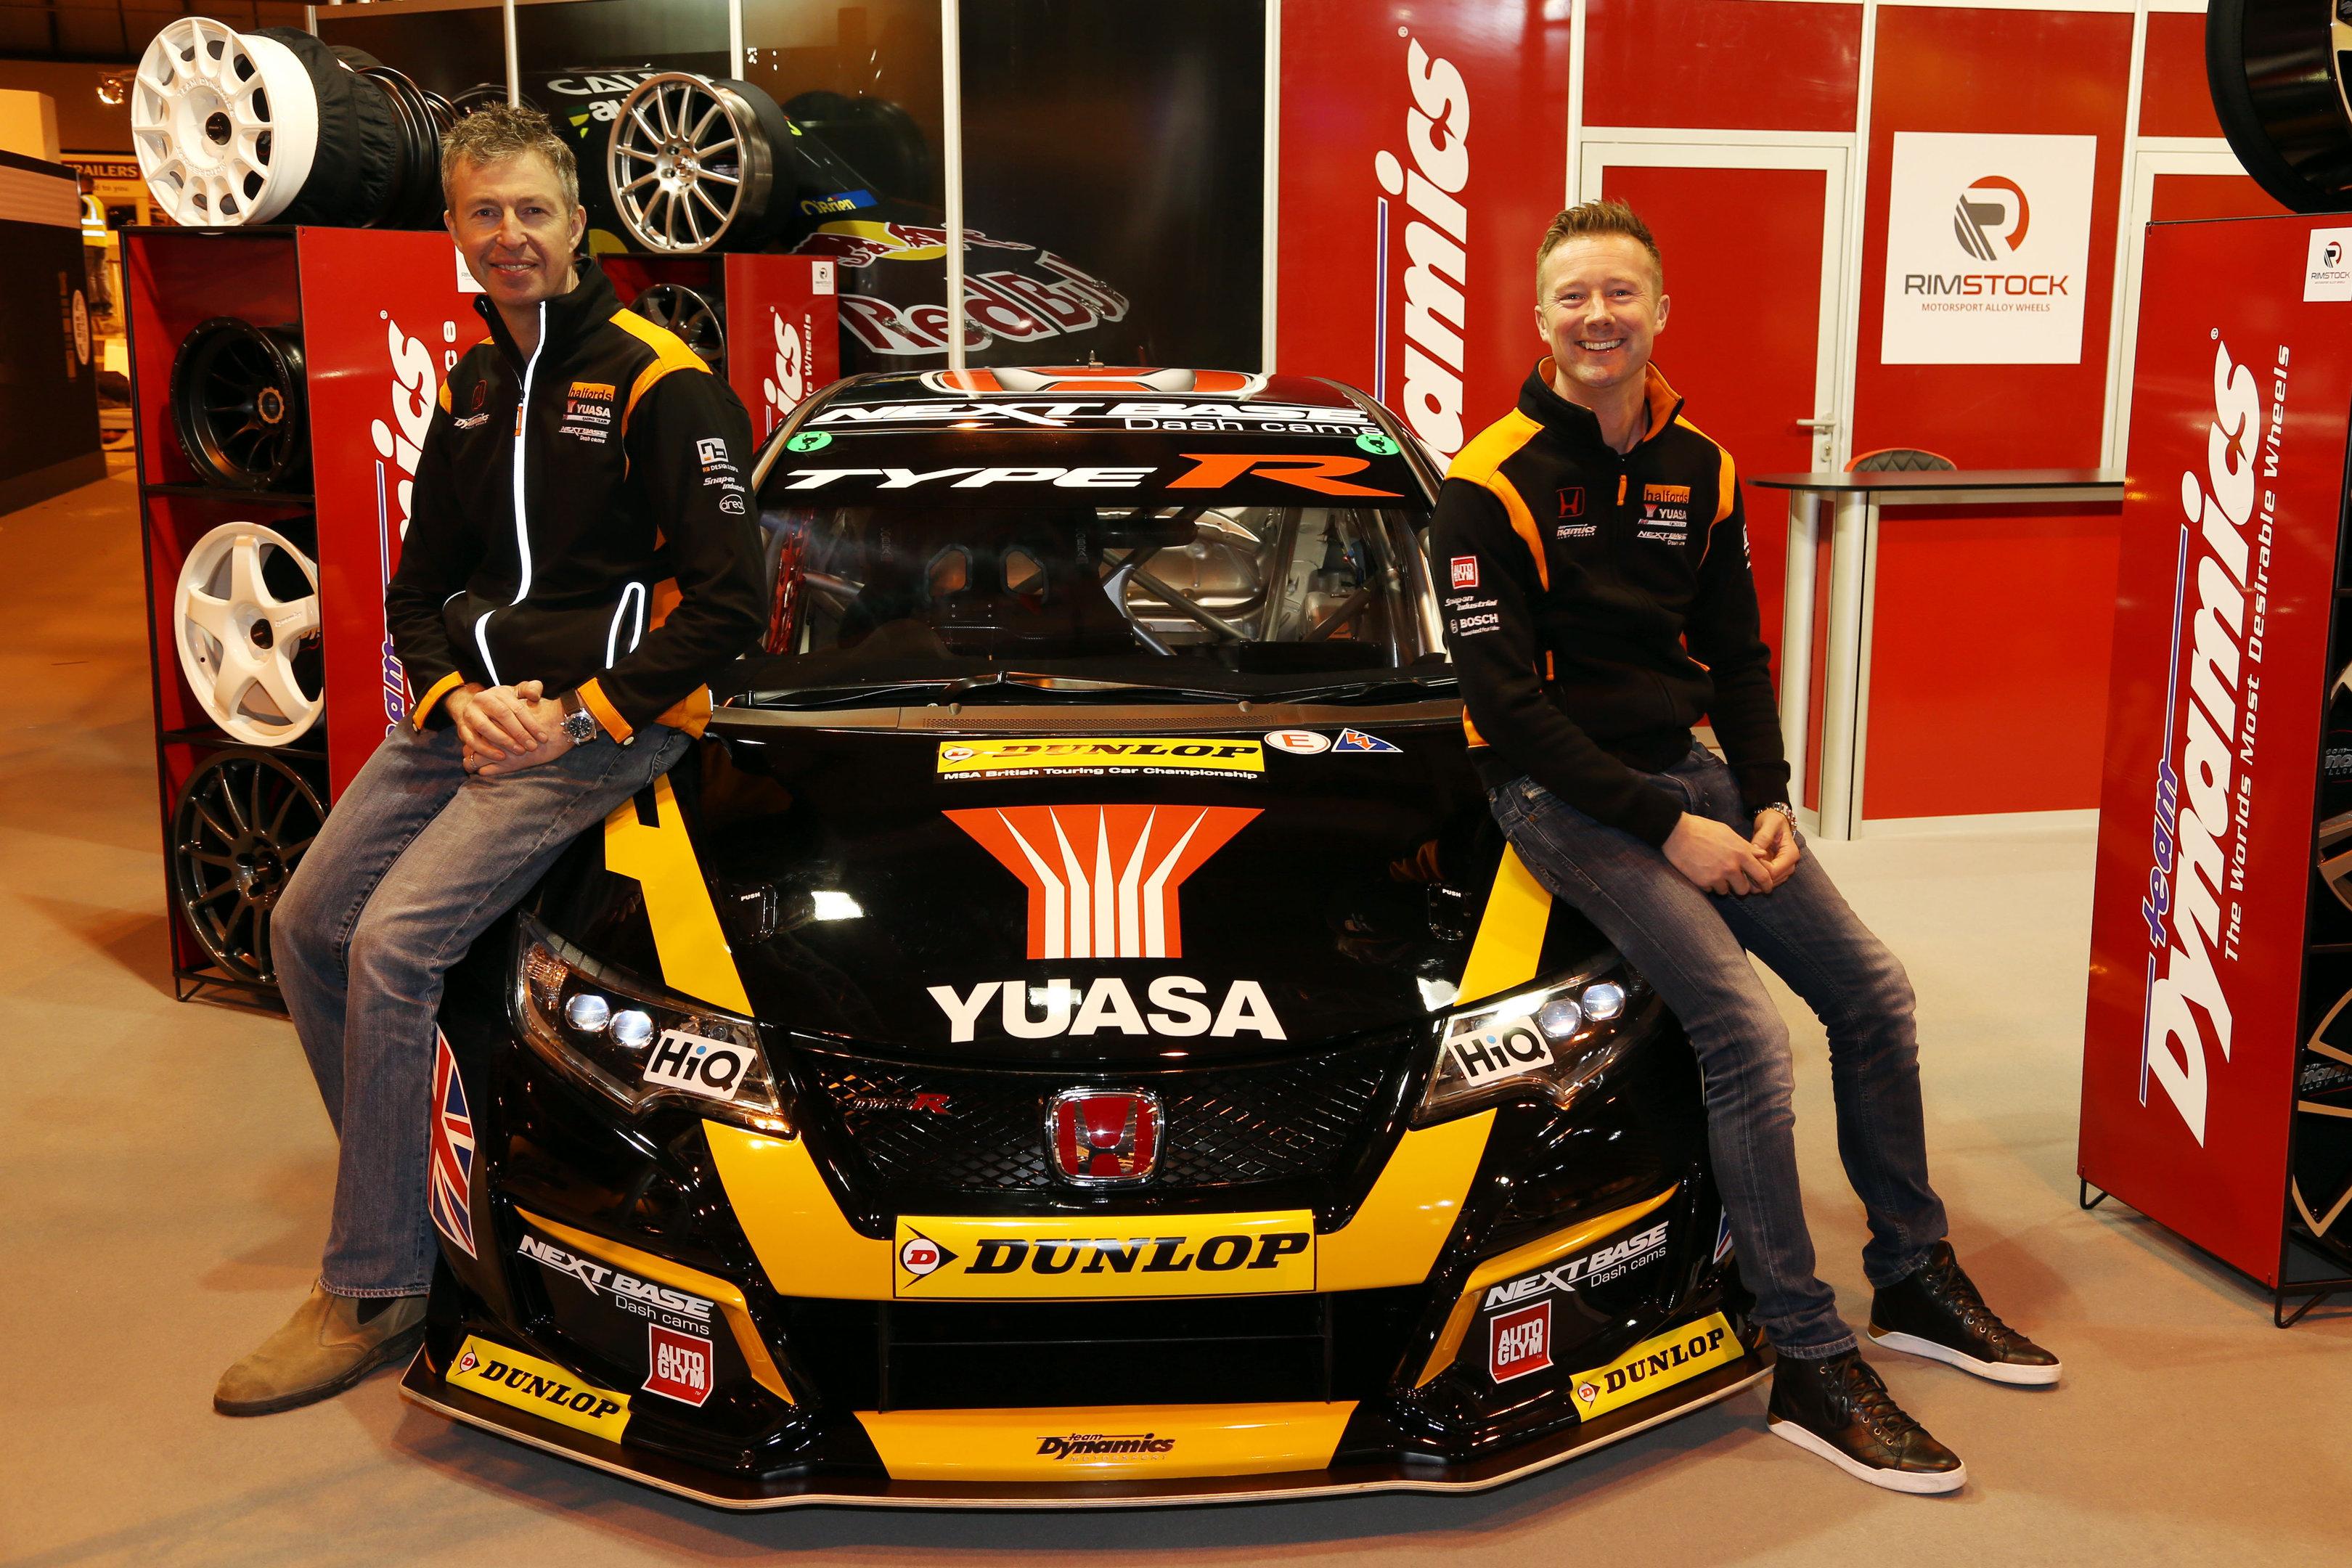 Gordon Shedden and teammate Matt Neal with the 2017 Honda Yuasa Racing Civic Type R BTCC contender